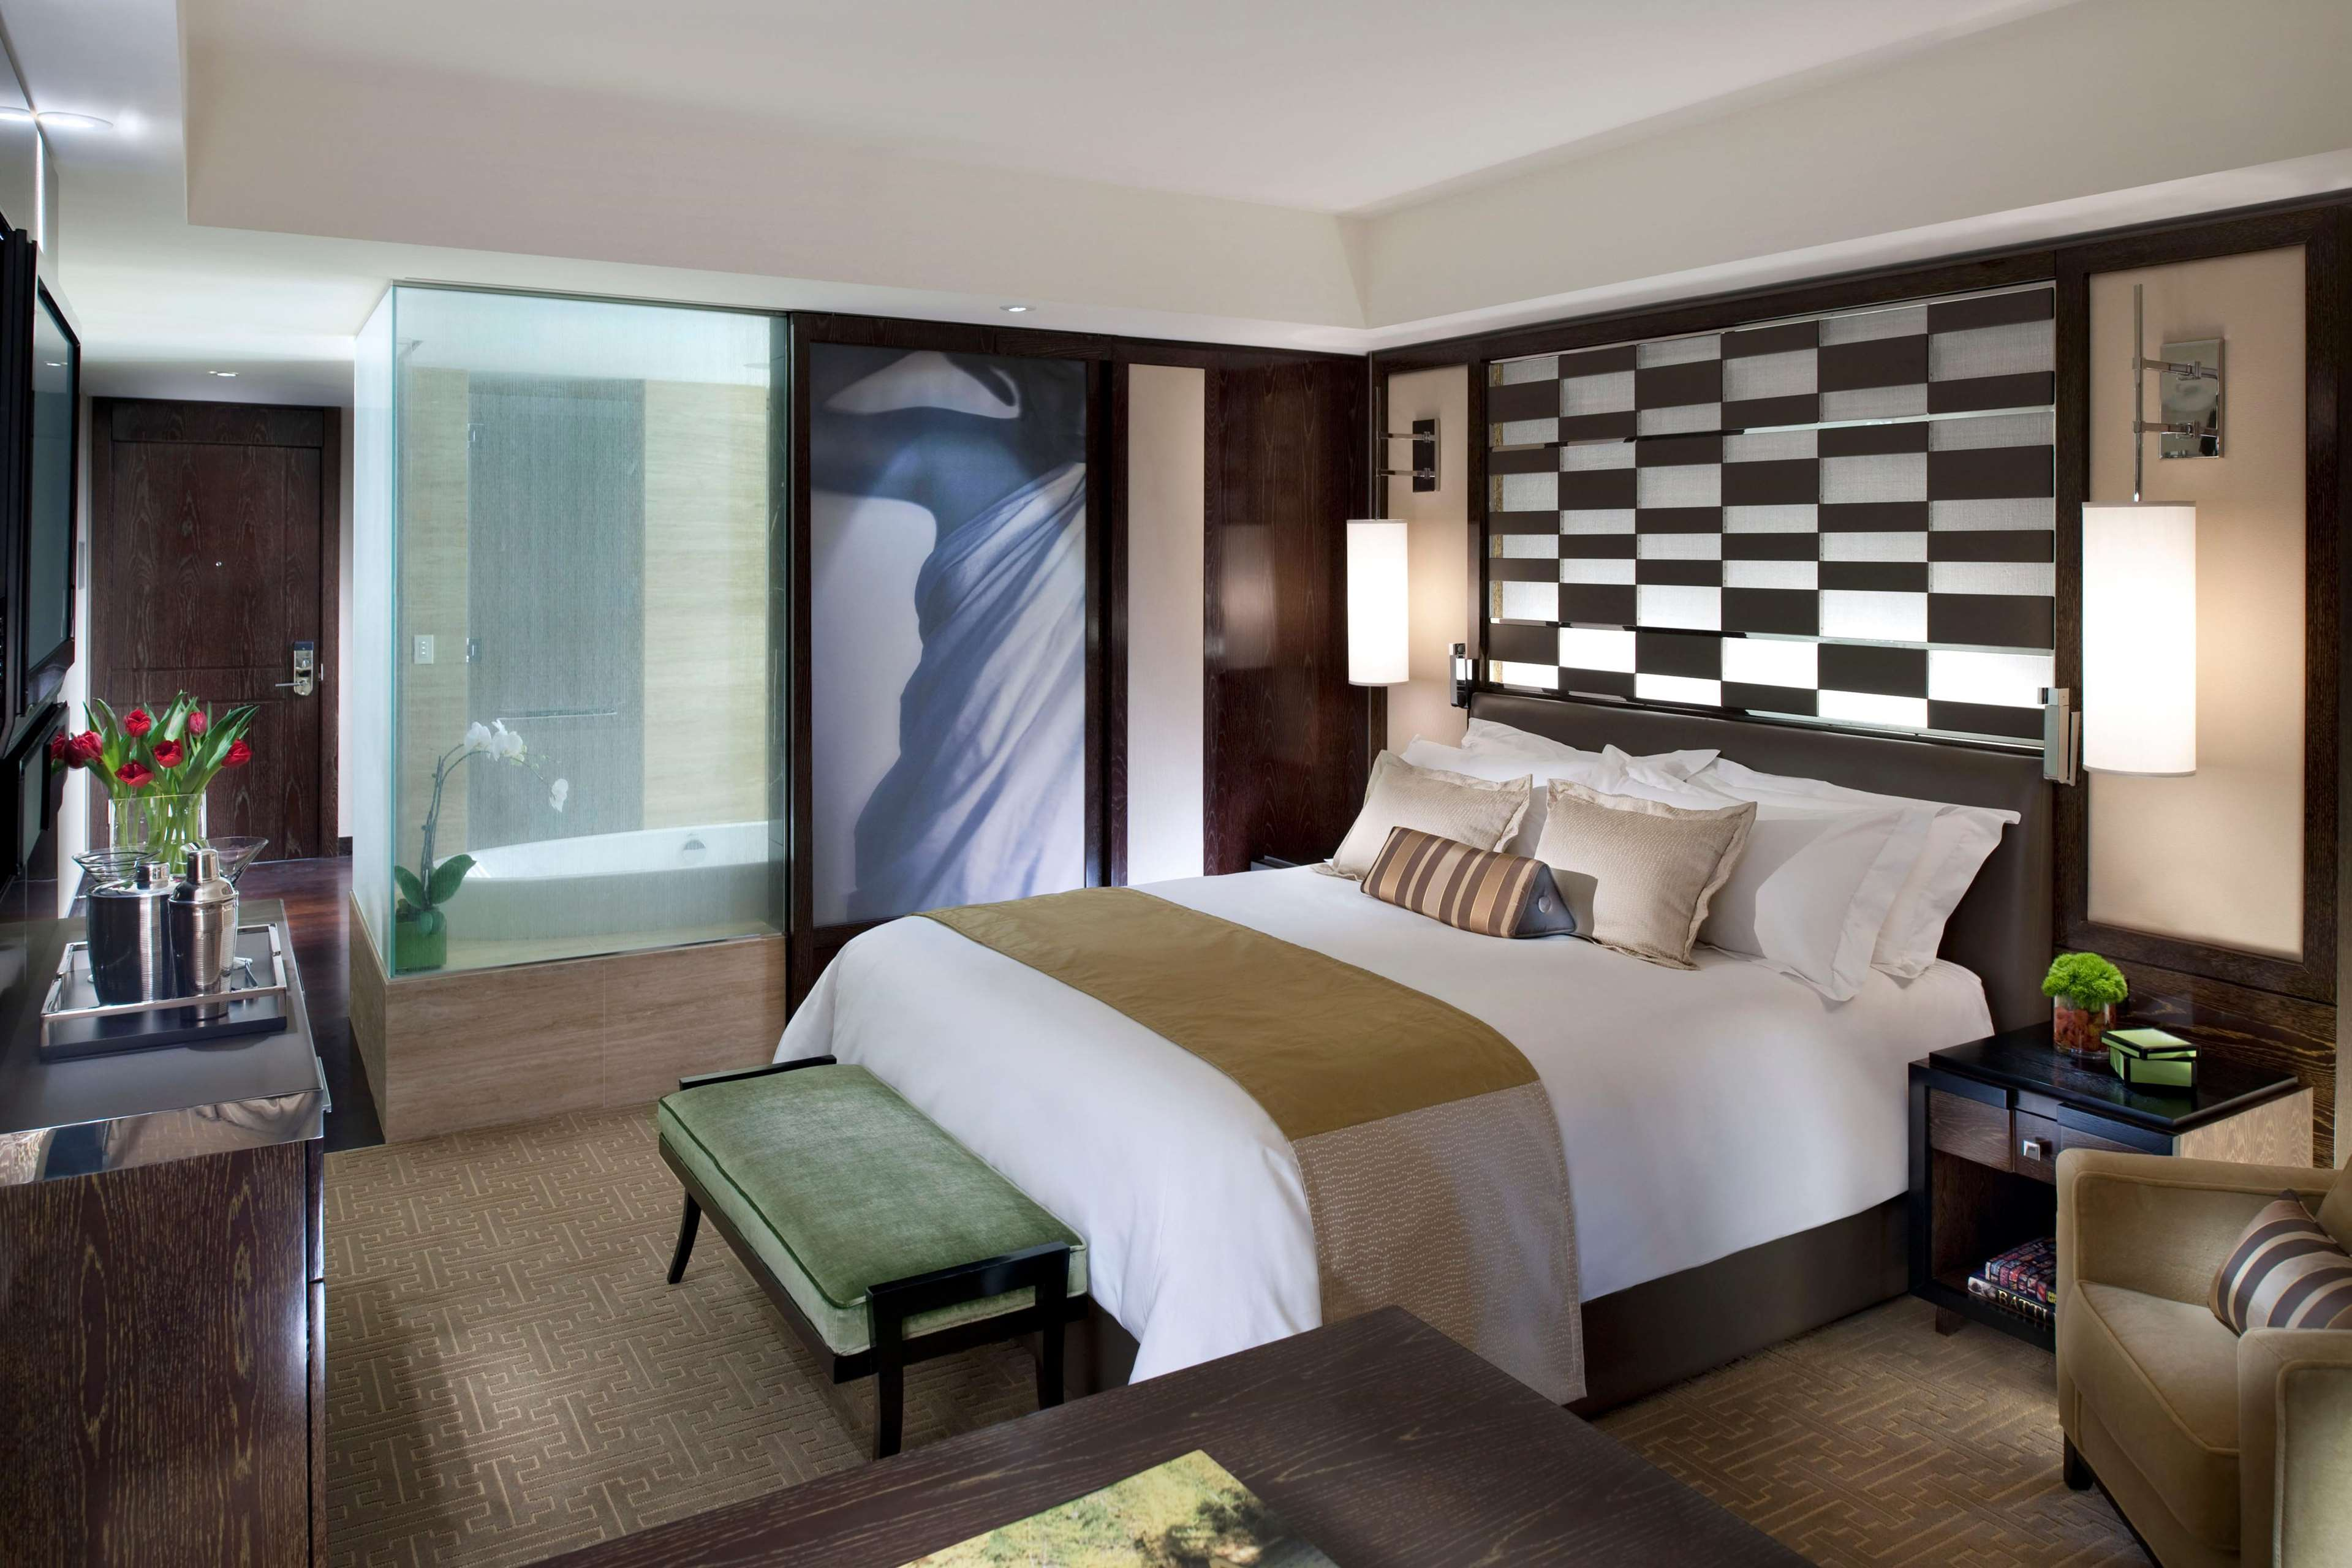 Waldorf Astoria Las Vegas image 43